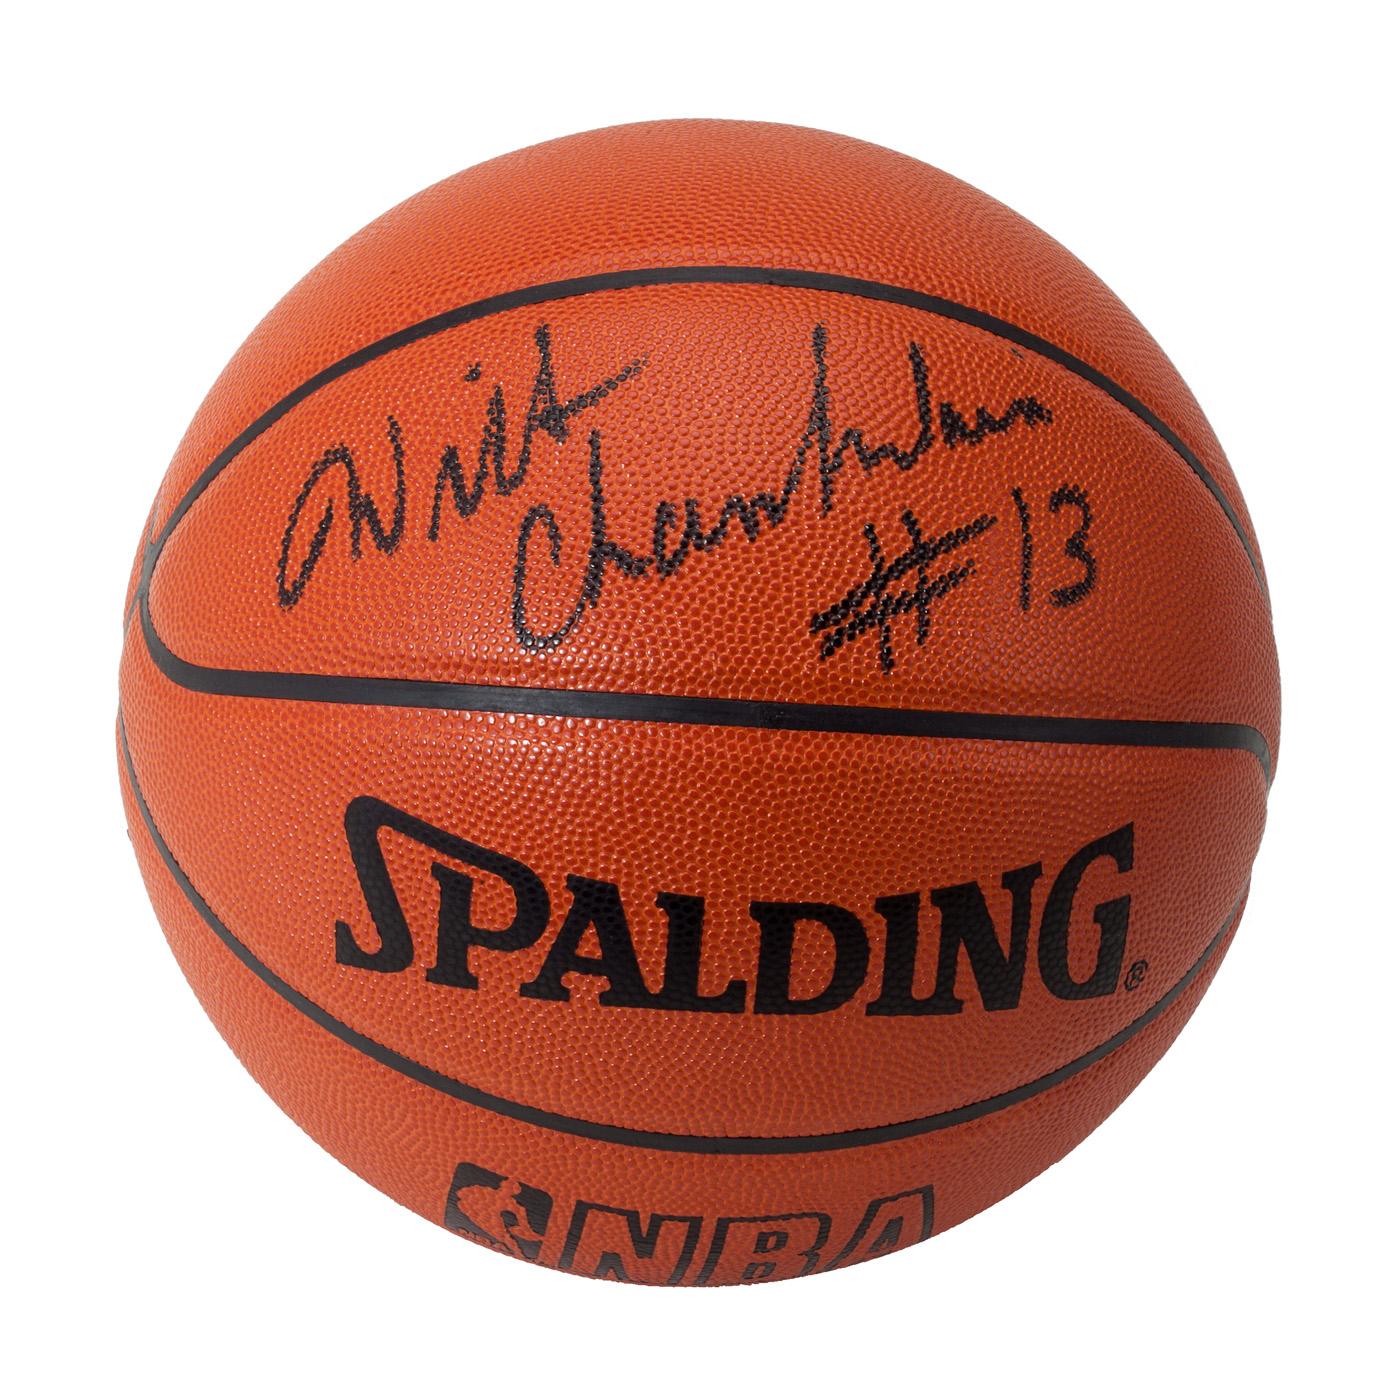 Wilt Chamberlain's Basketball